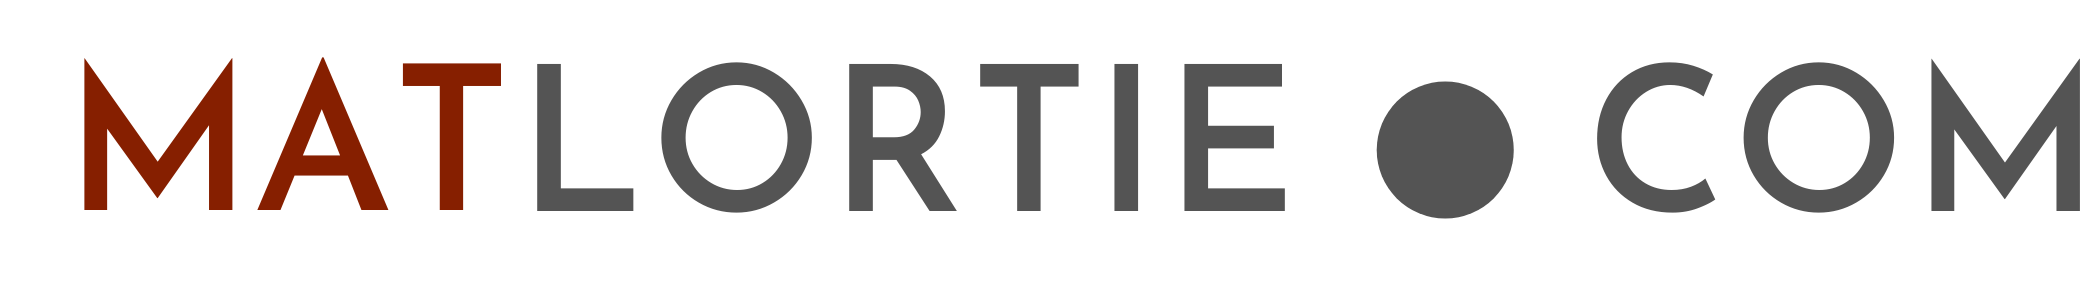 Matlortie.com